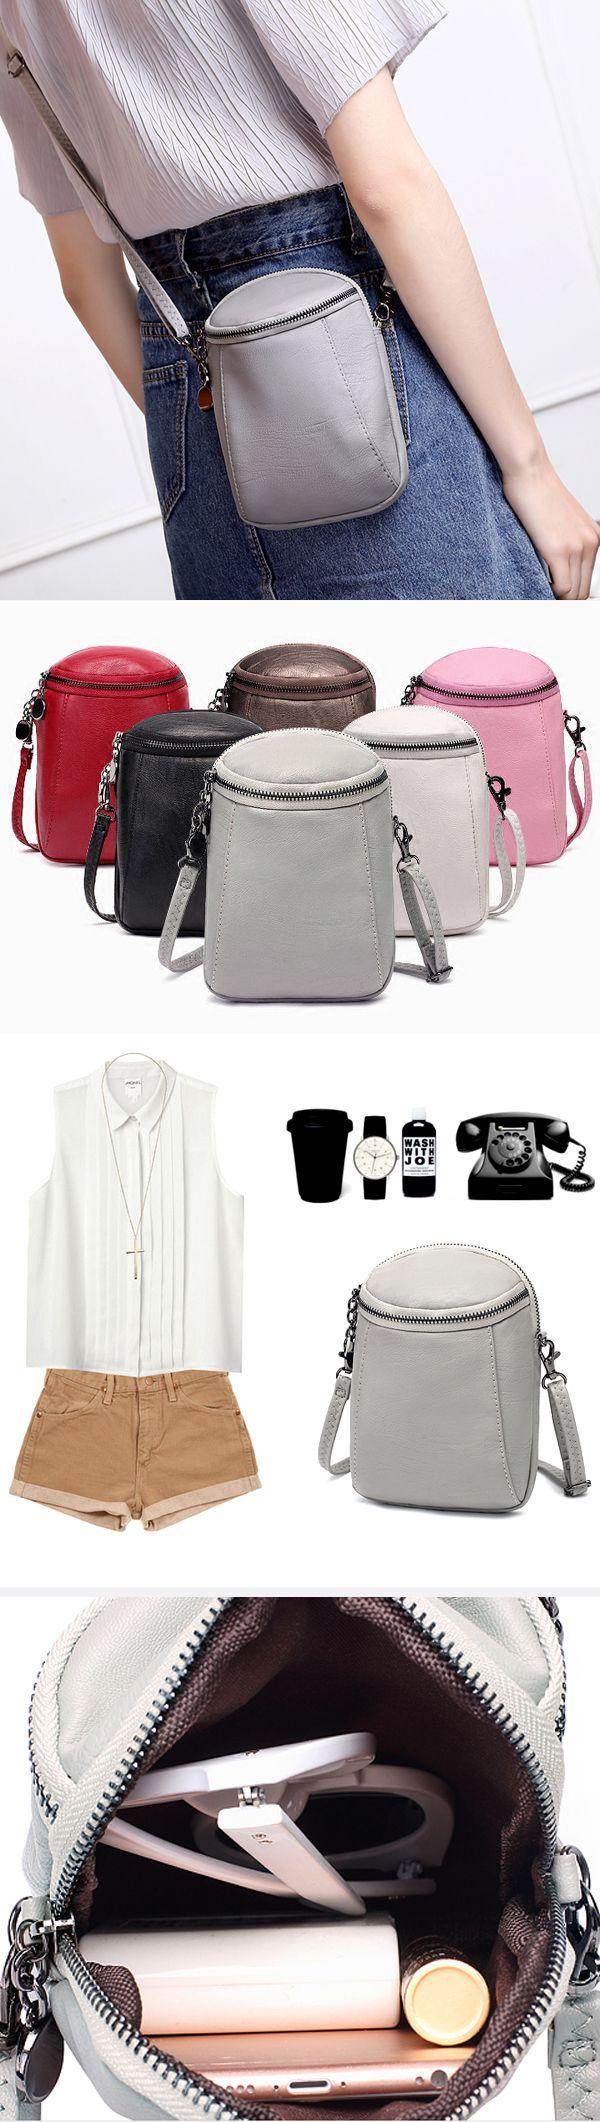 [$ 10.47]   Woman Round Little Phone Bag Casual PU Crossbody Bag Bucket Bag Vintage Bag